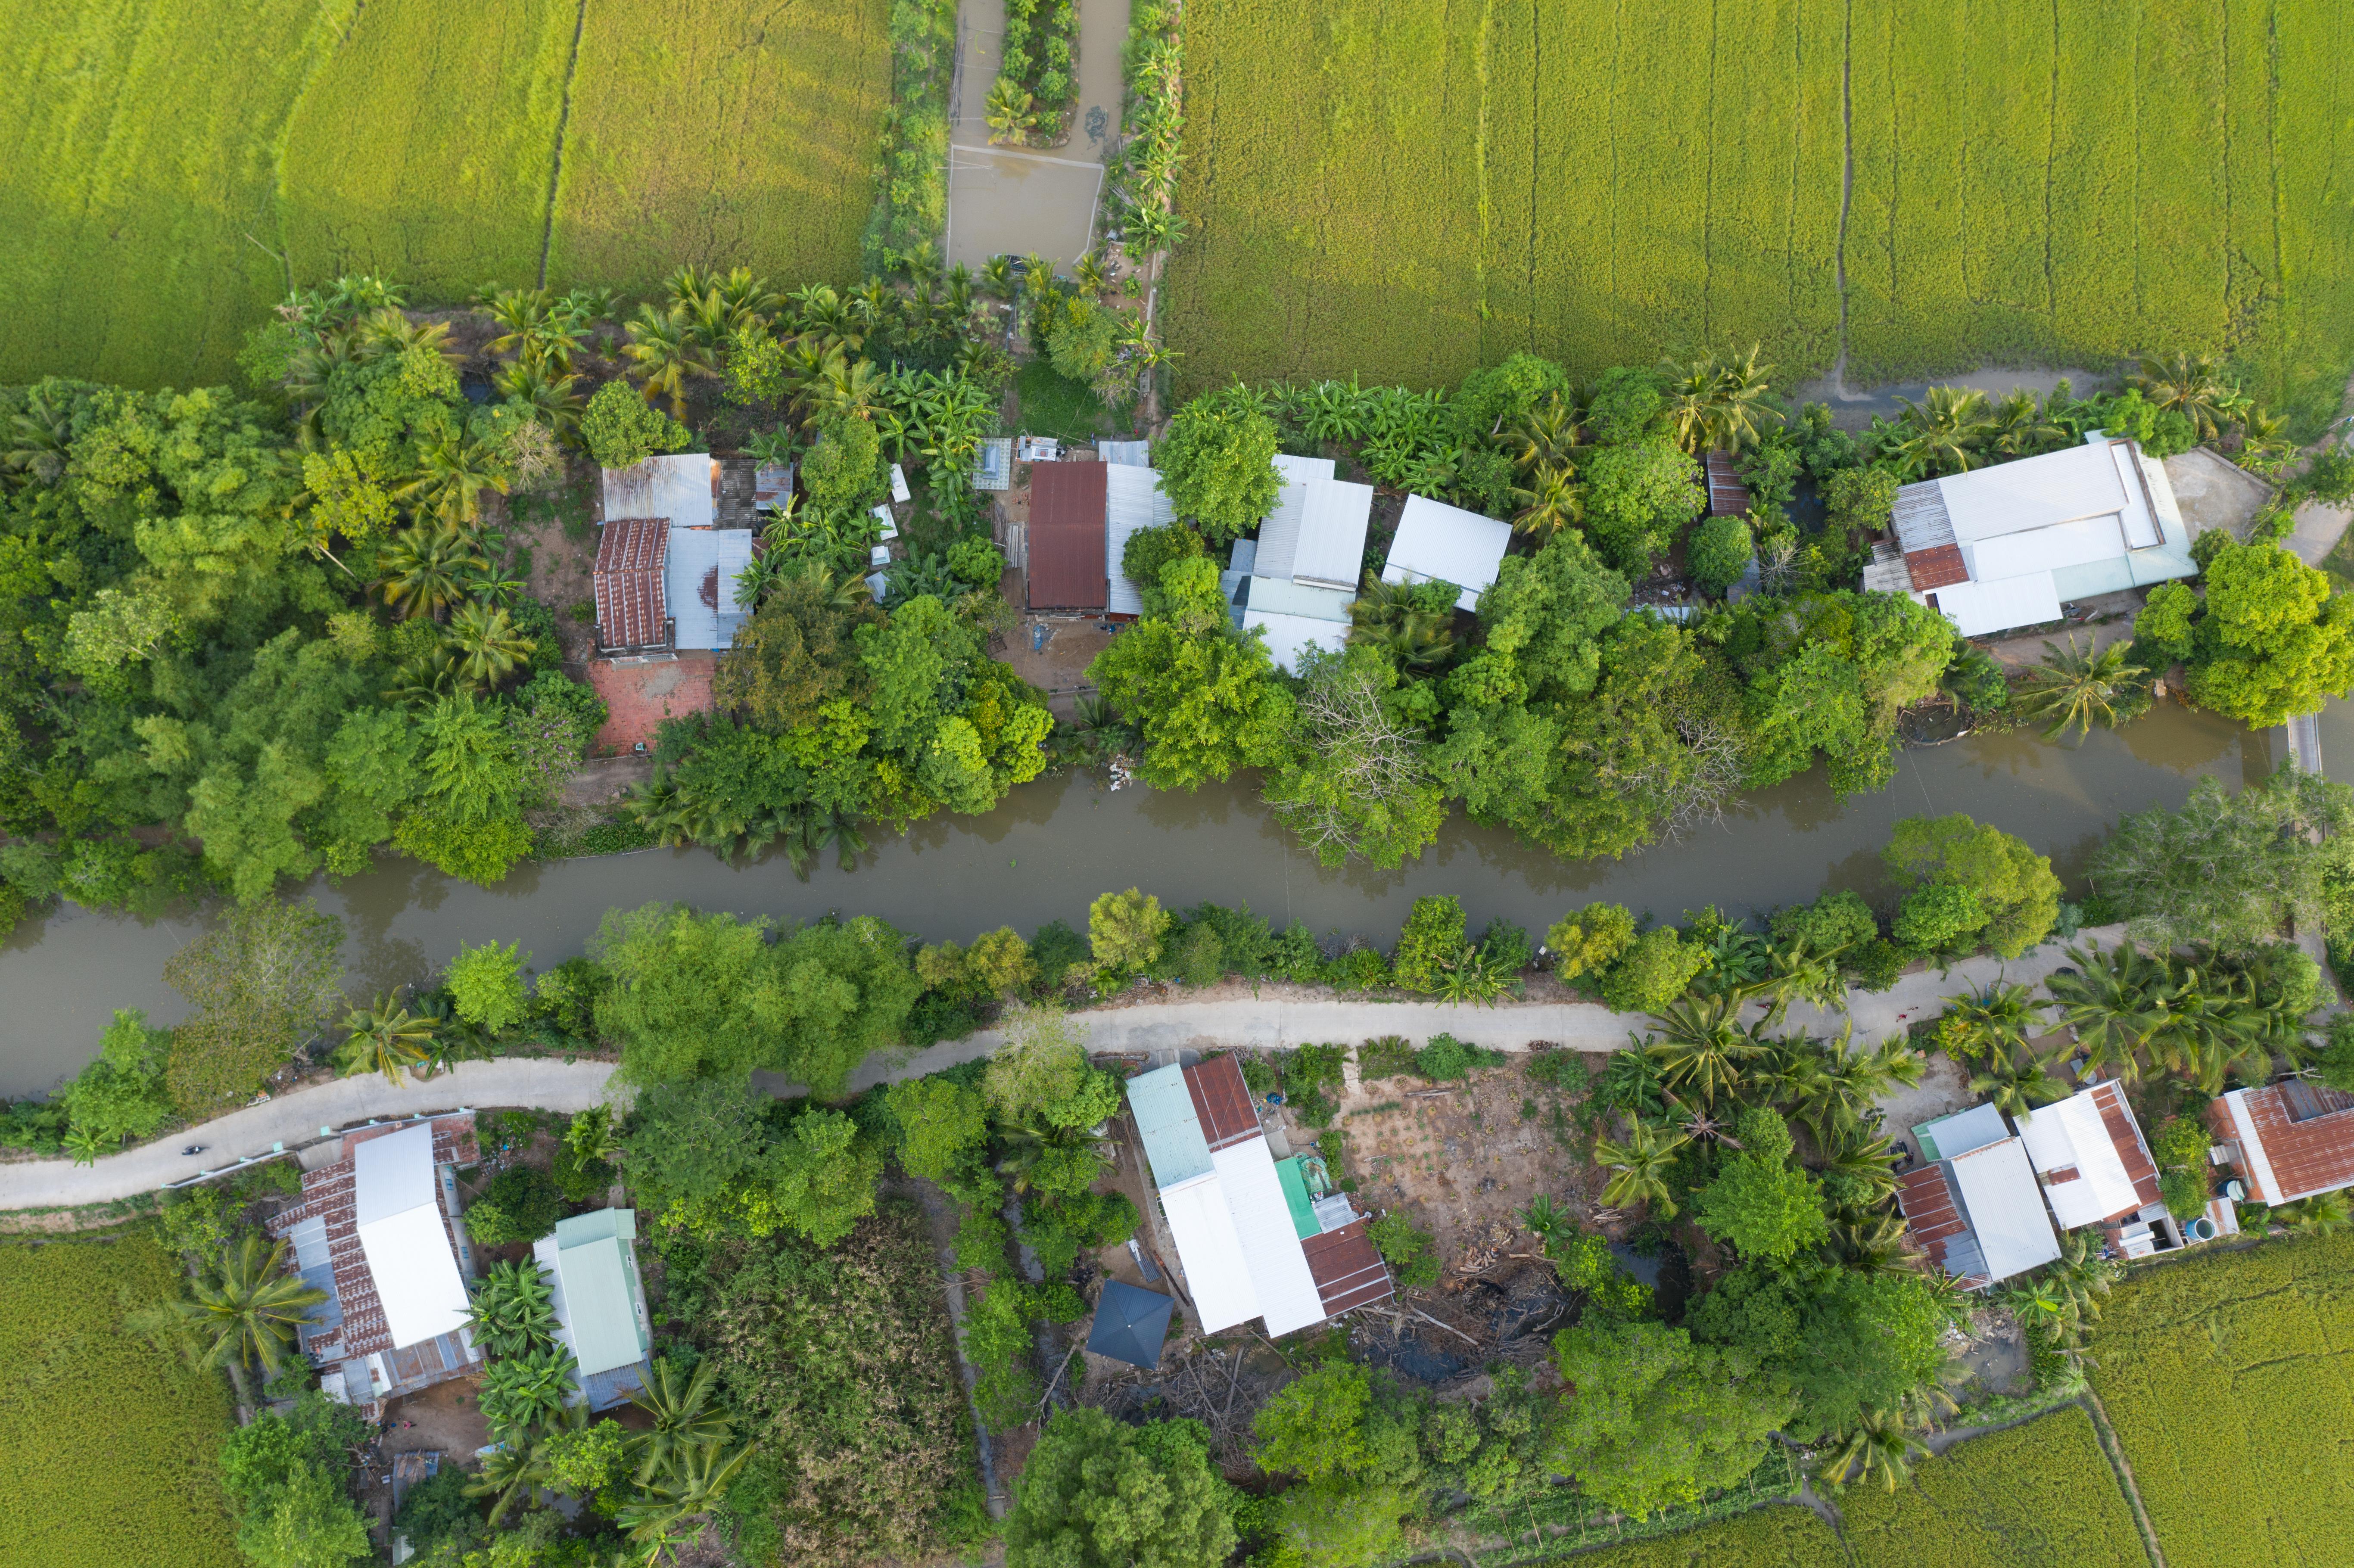 Laos - cesty bez asfaltu